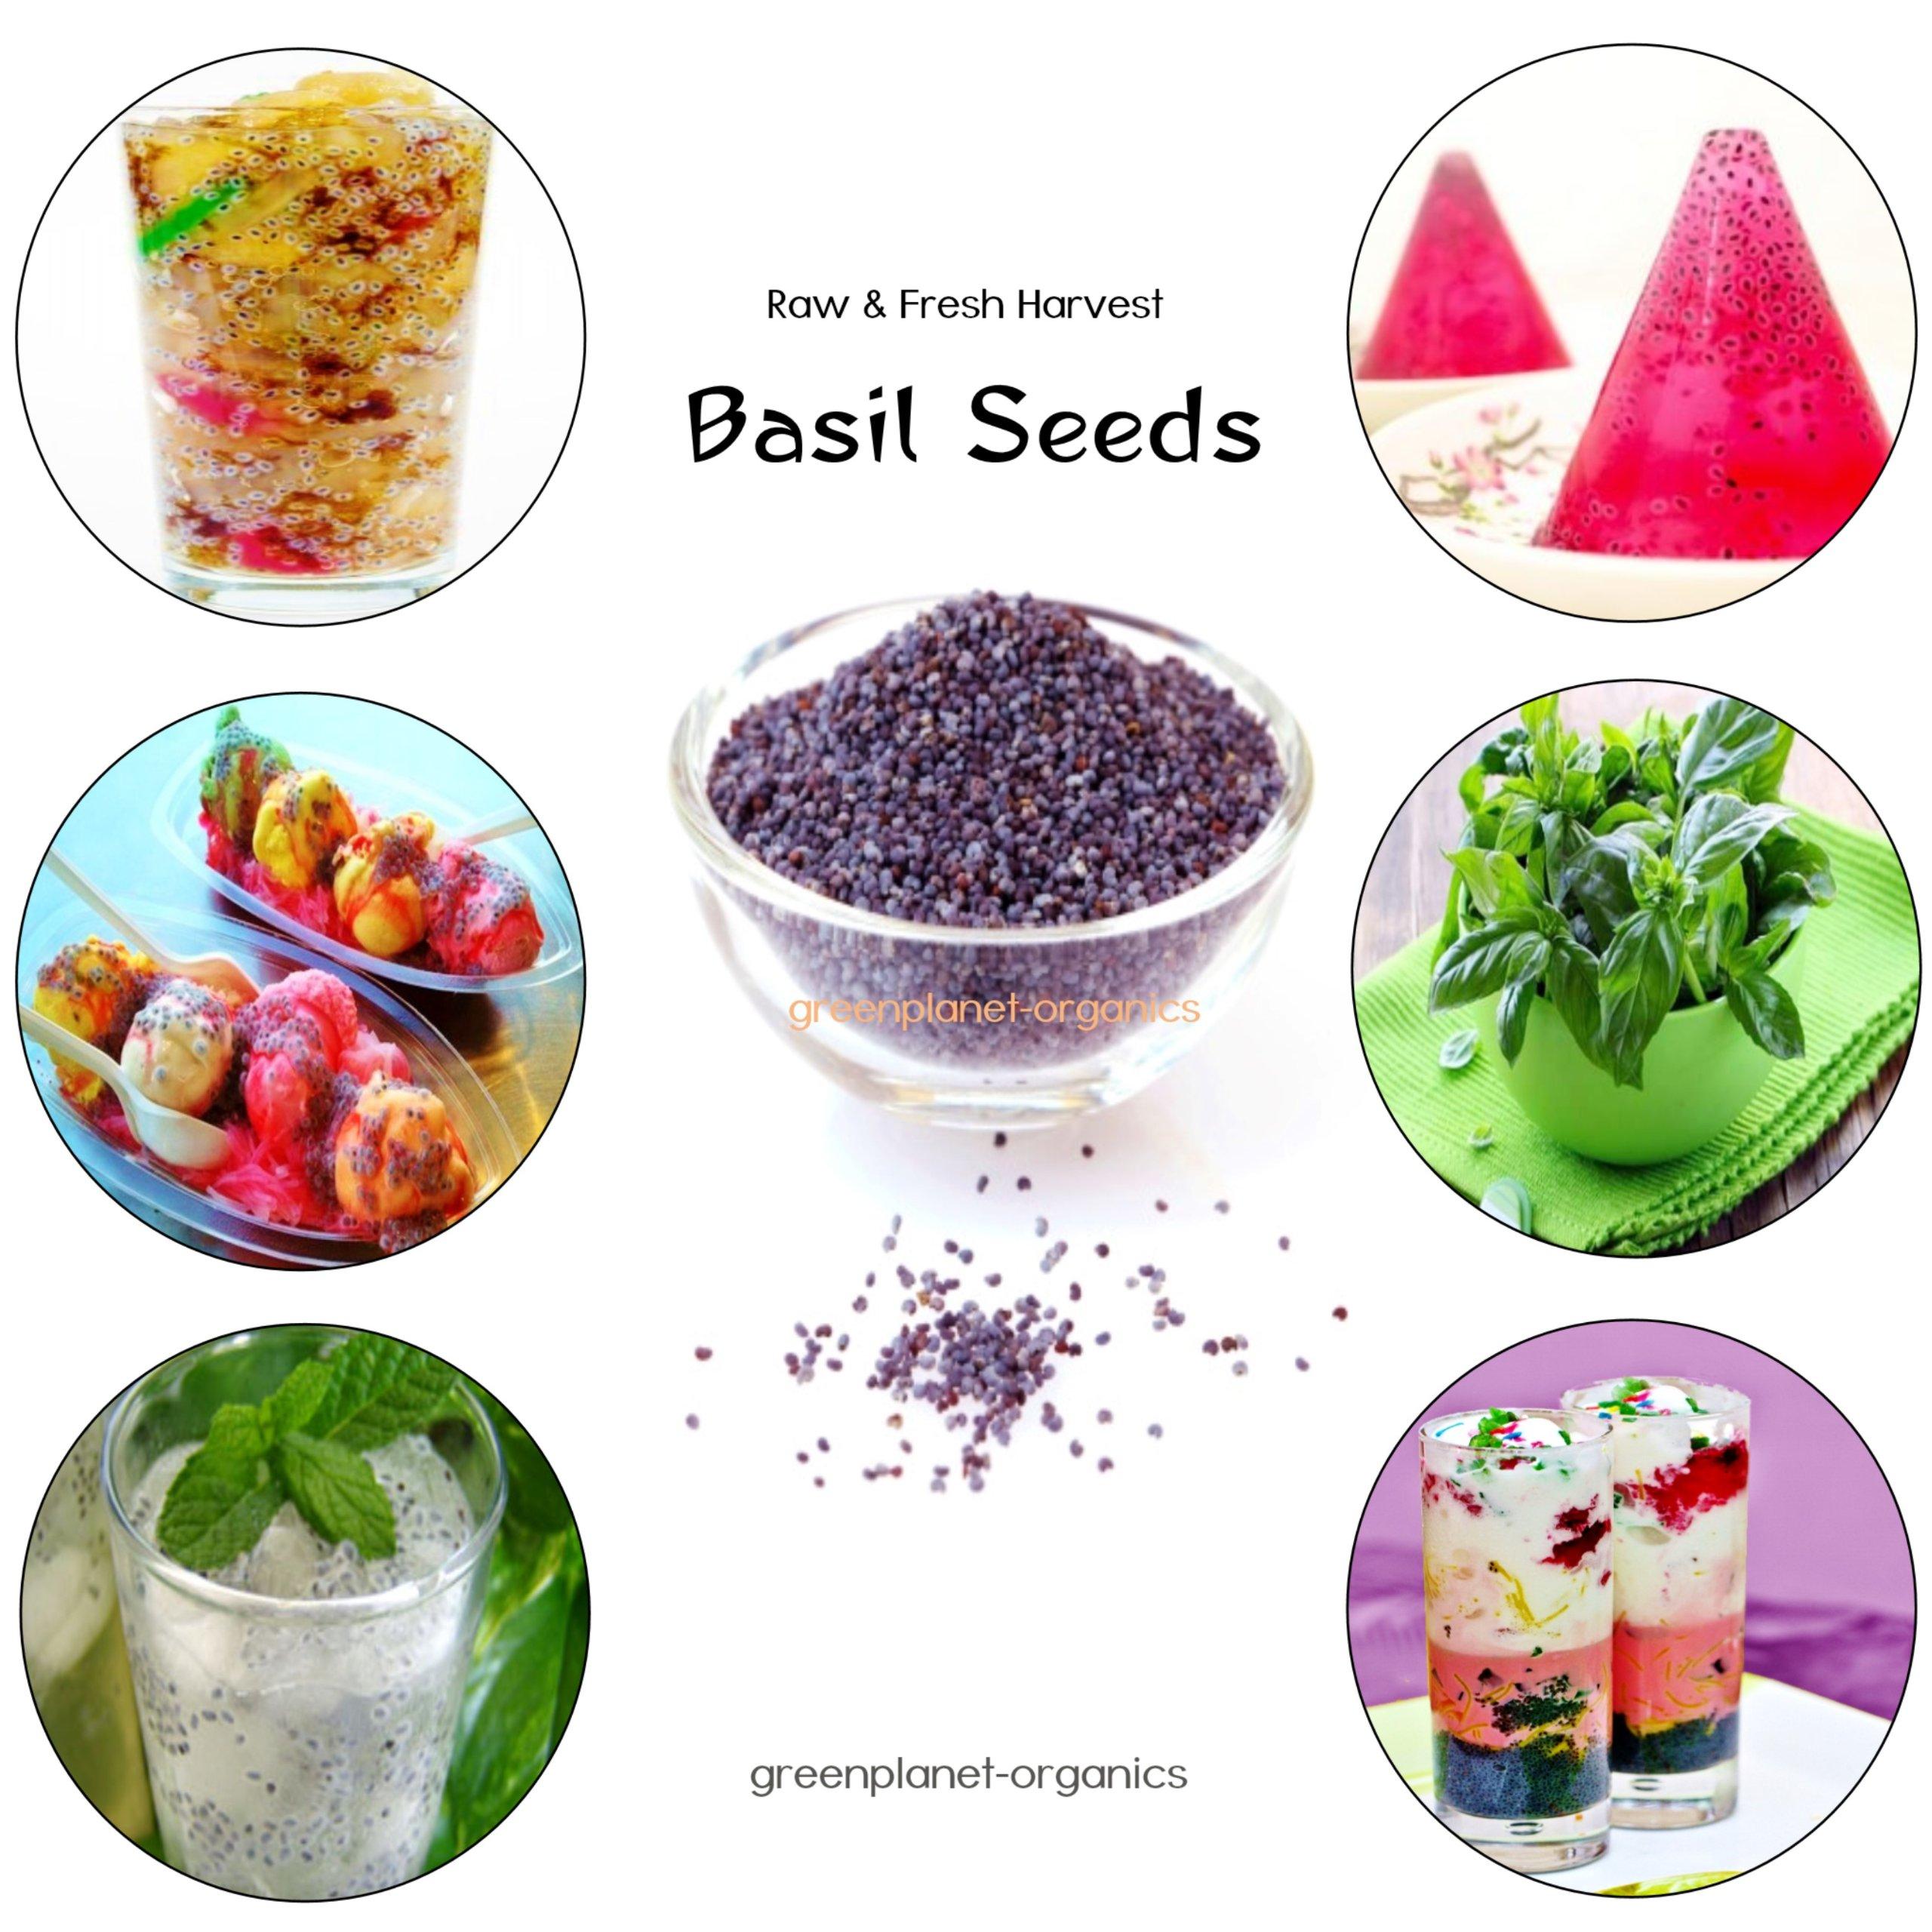 2 LBS Pure Basil Seeds (Raw & Fresh) Tulsi Seeds, Tukmaria, Tukh Balanga/Malanga, Sabja